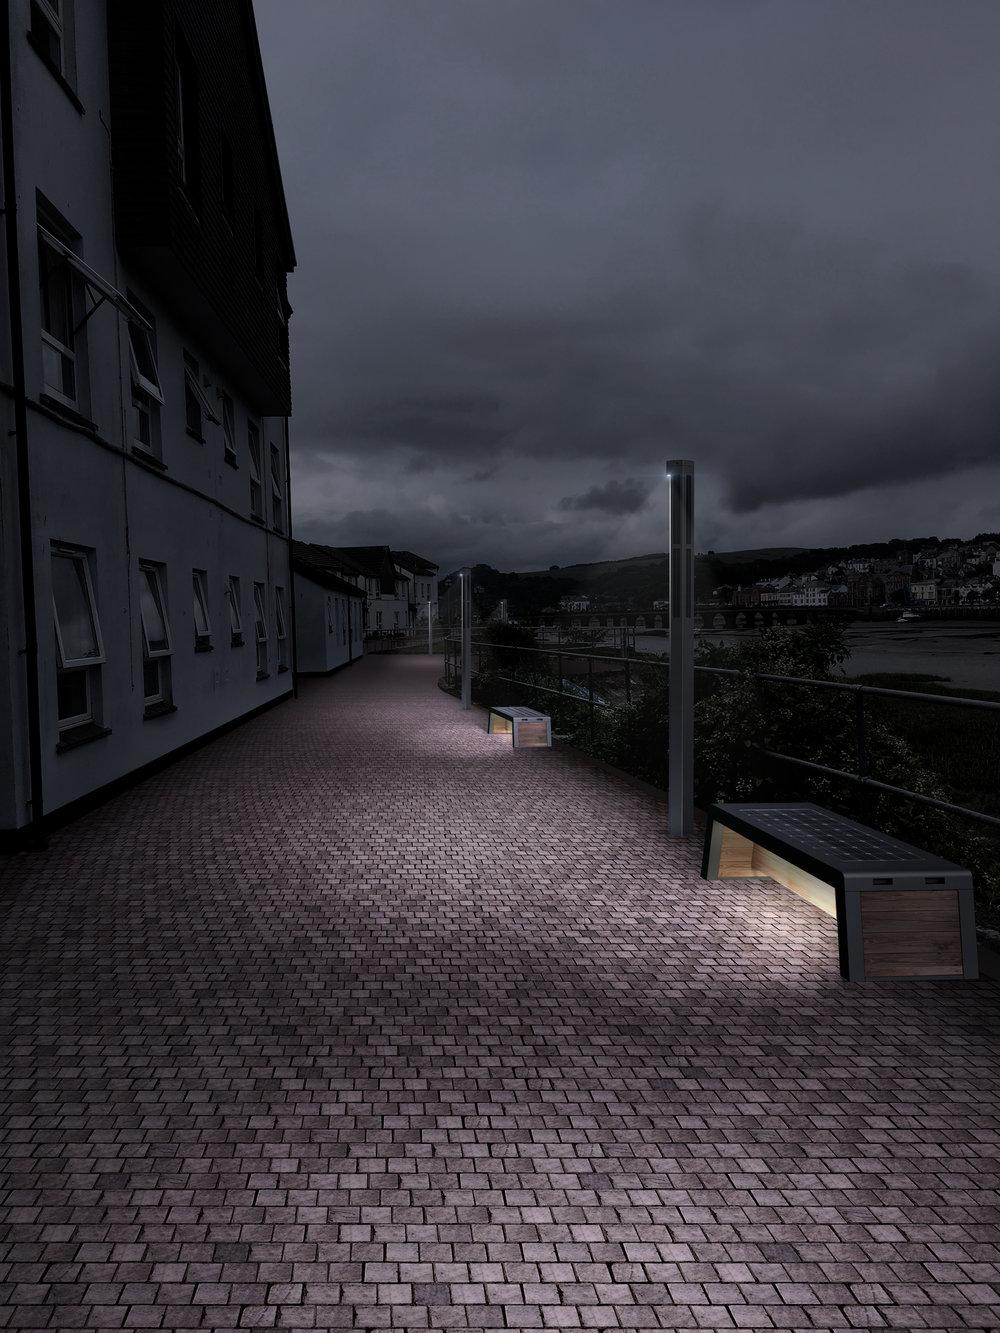 Bideford_SolarStreet_2m_PlusBench_Dusk-1.jpg